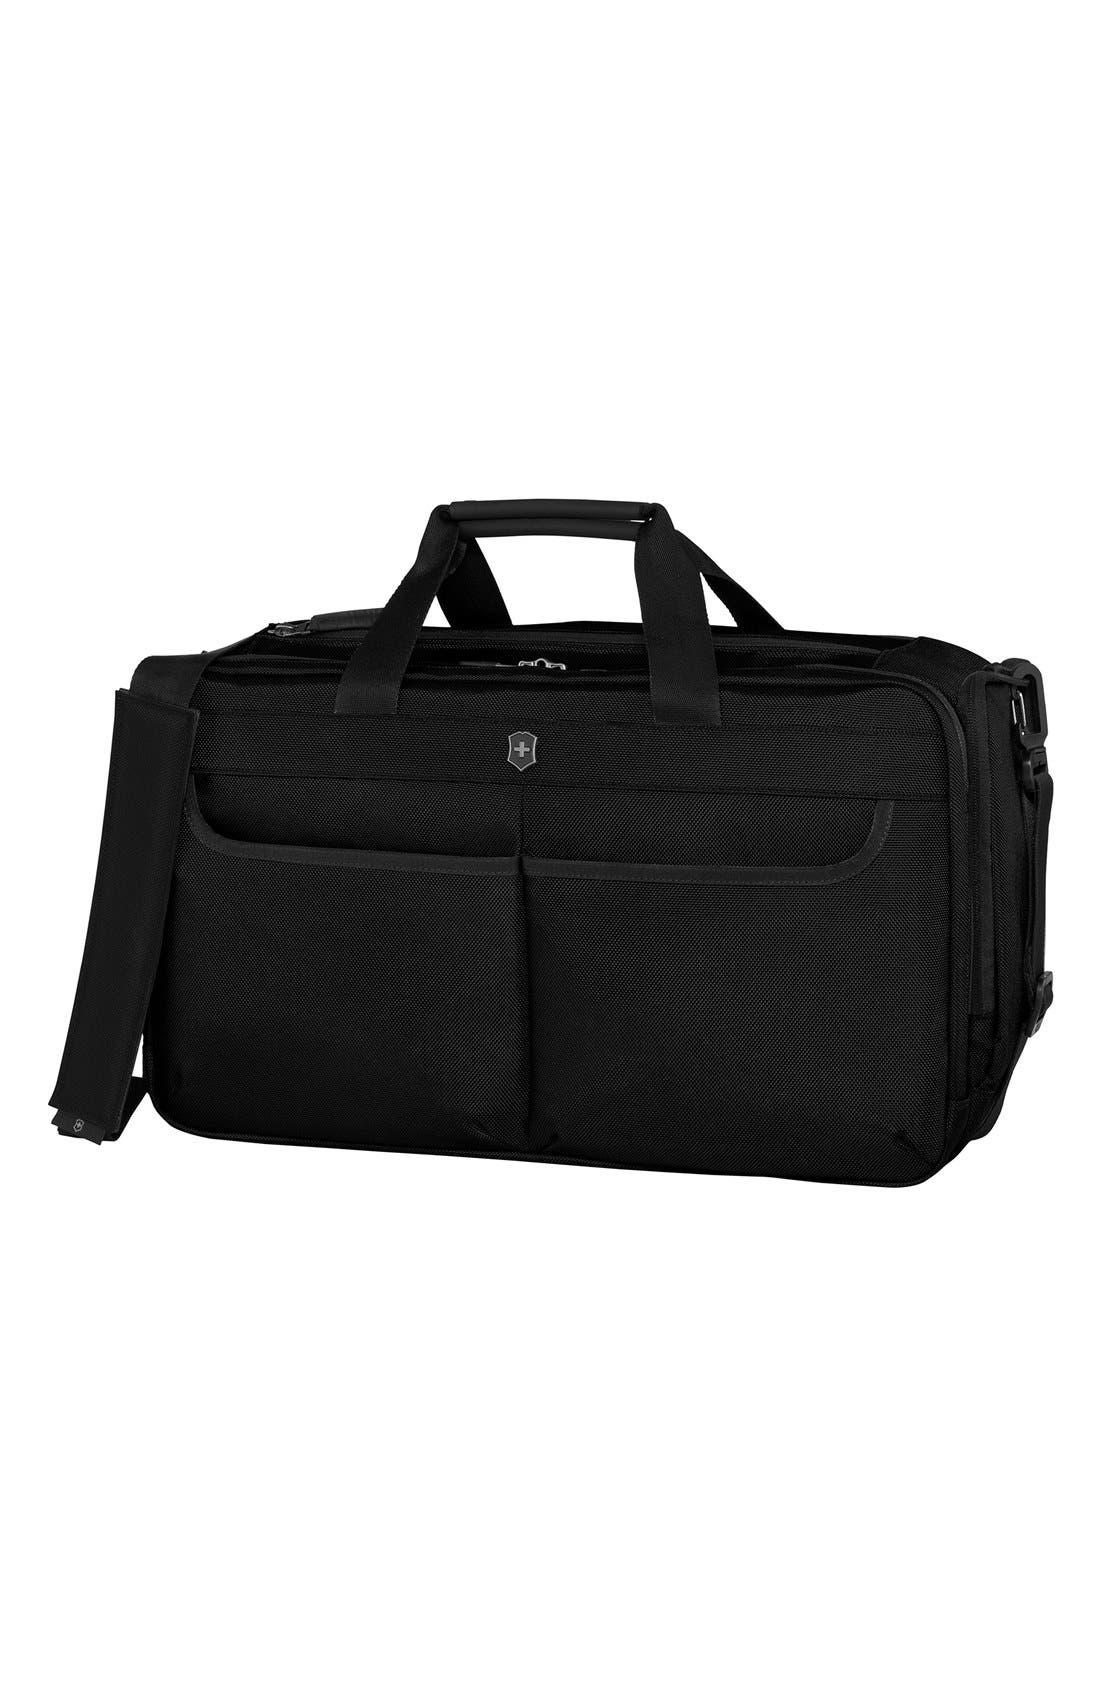 WT 5.0 Duffel Bag,                             Main thumbnail 1, color,                             BLACK